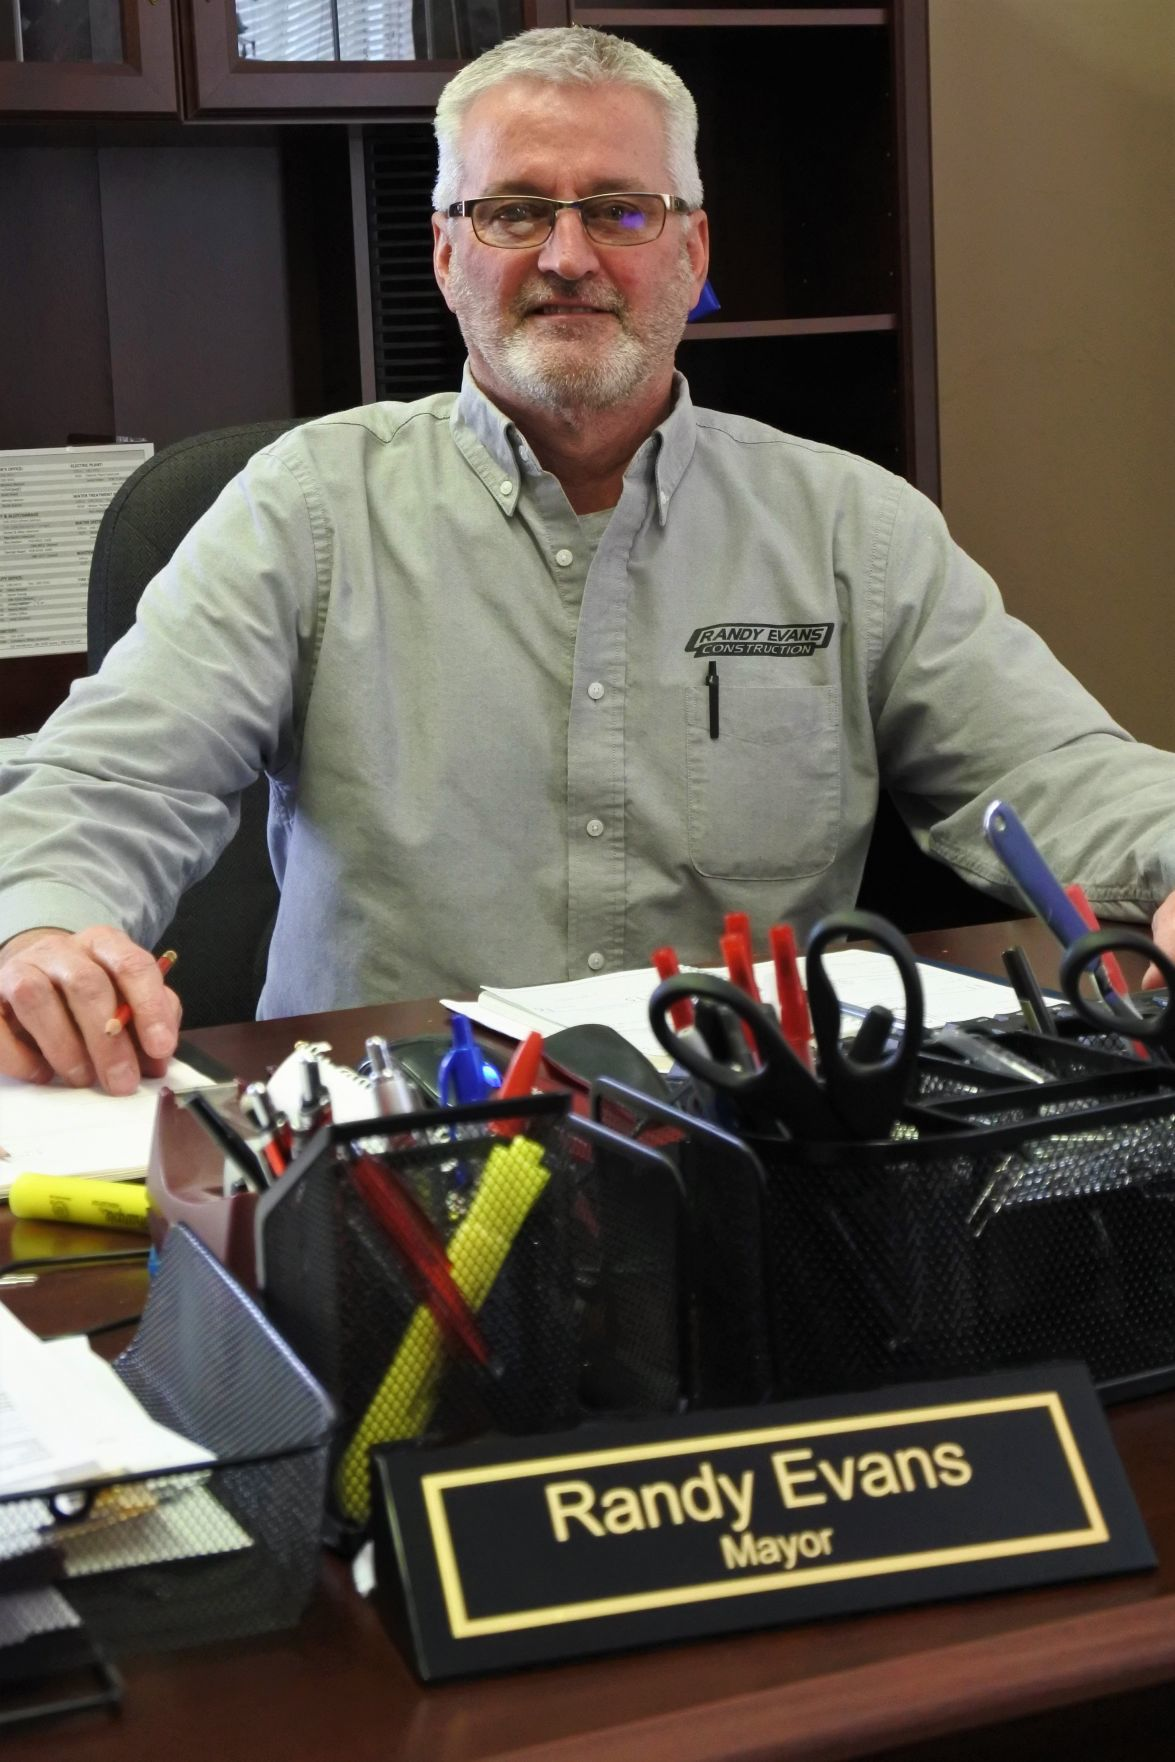 Meet the Mayor: Randy Evans